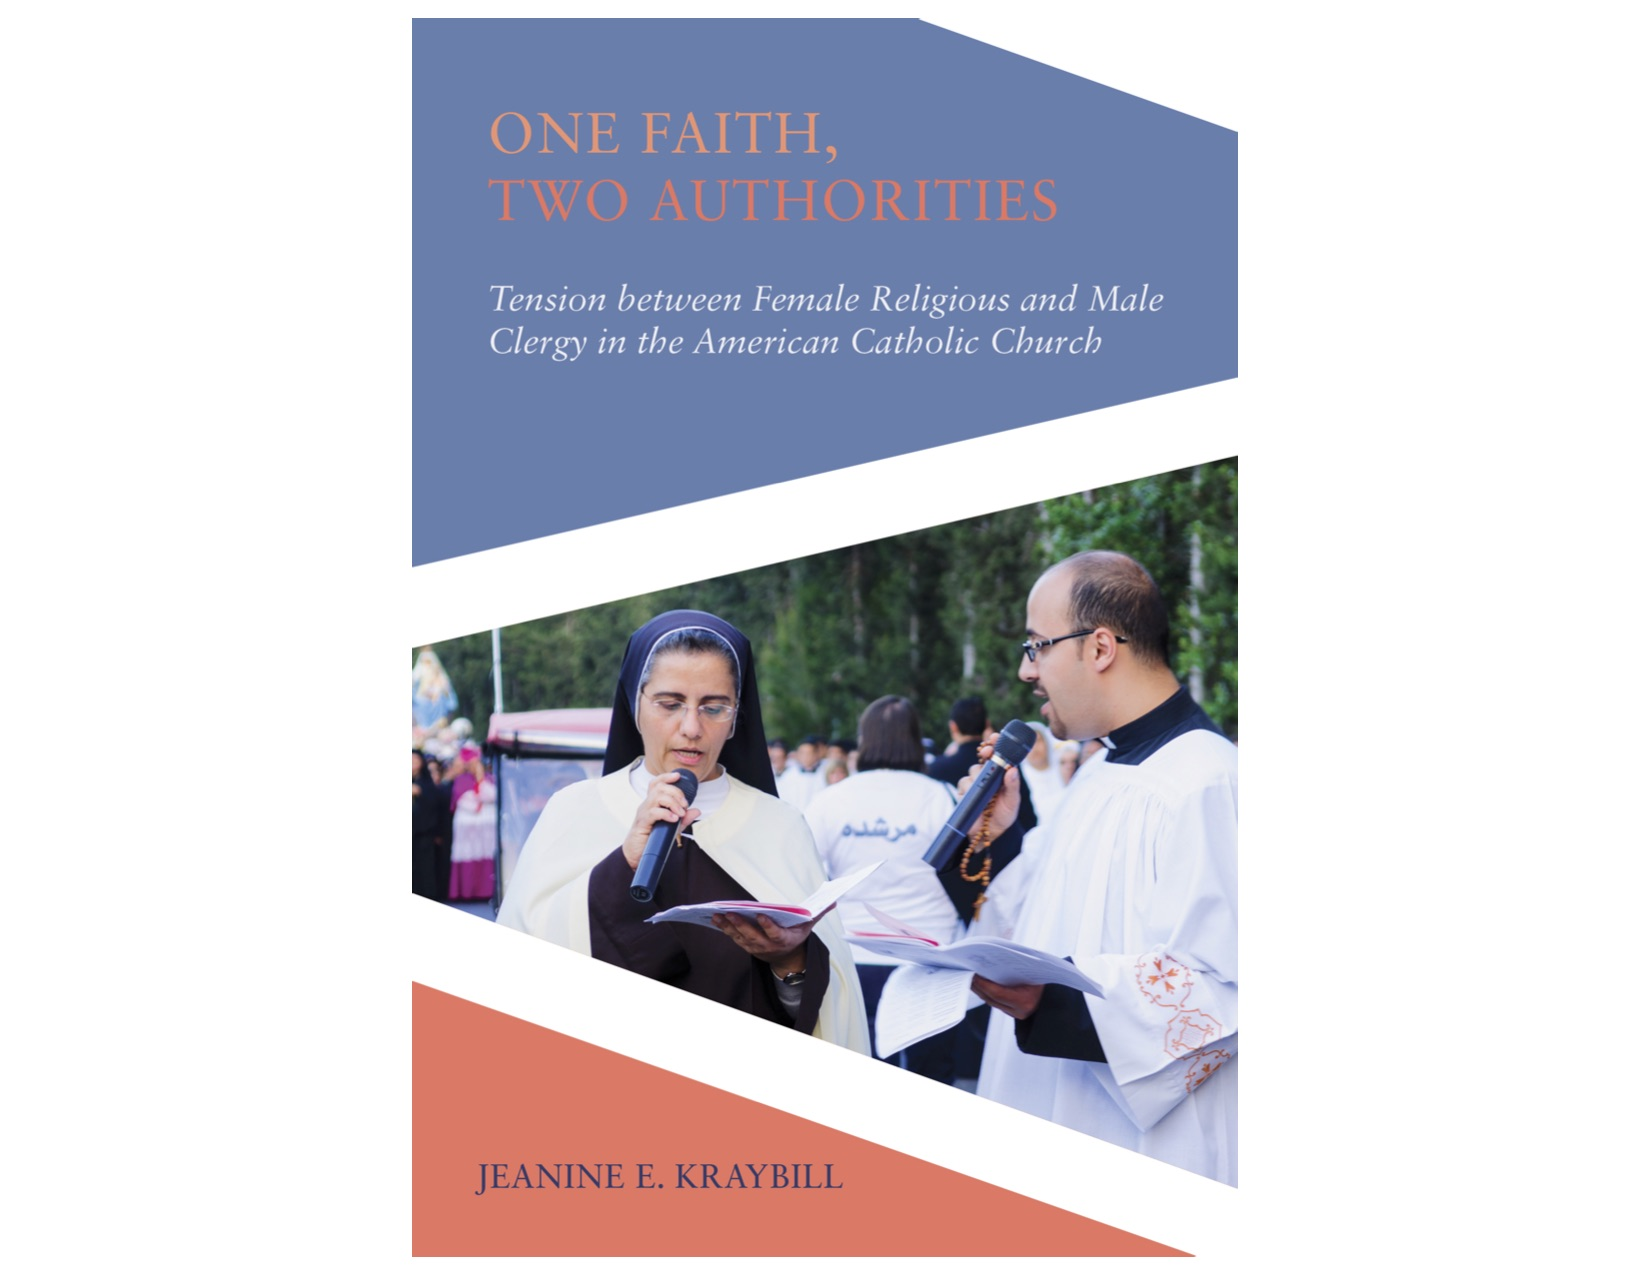 One Faith Two Authorities (3)